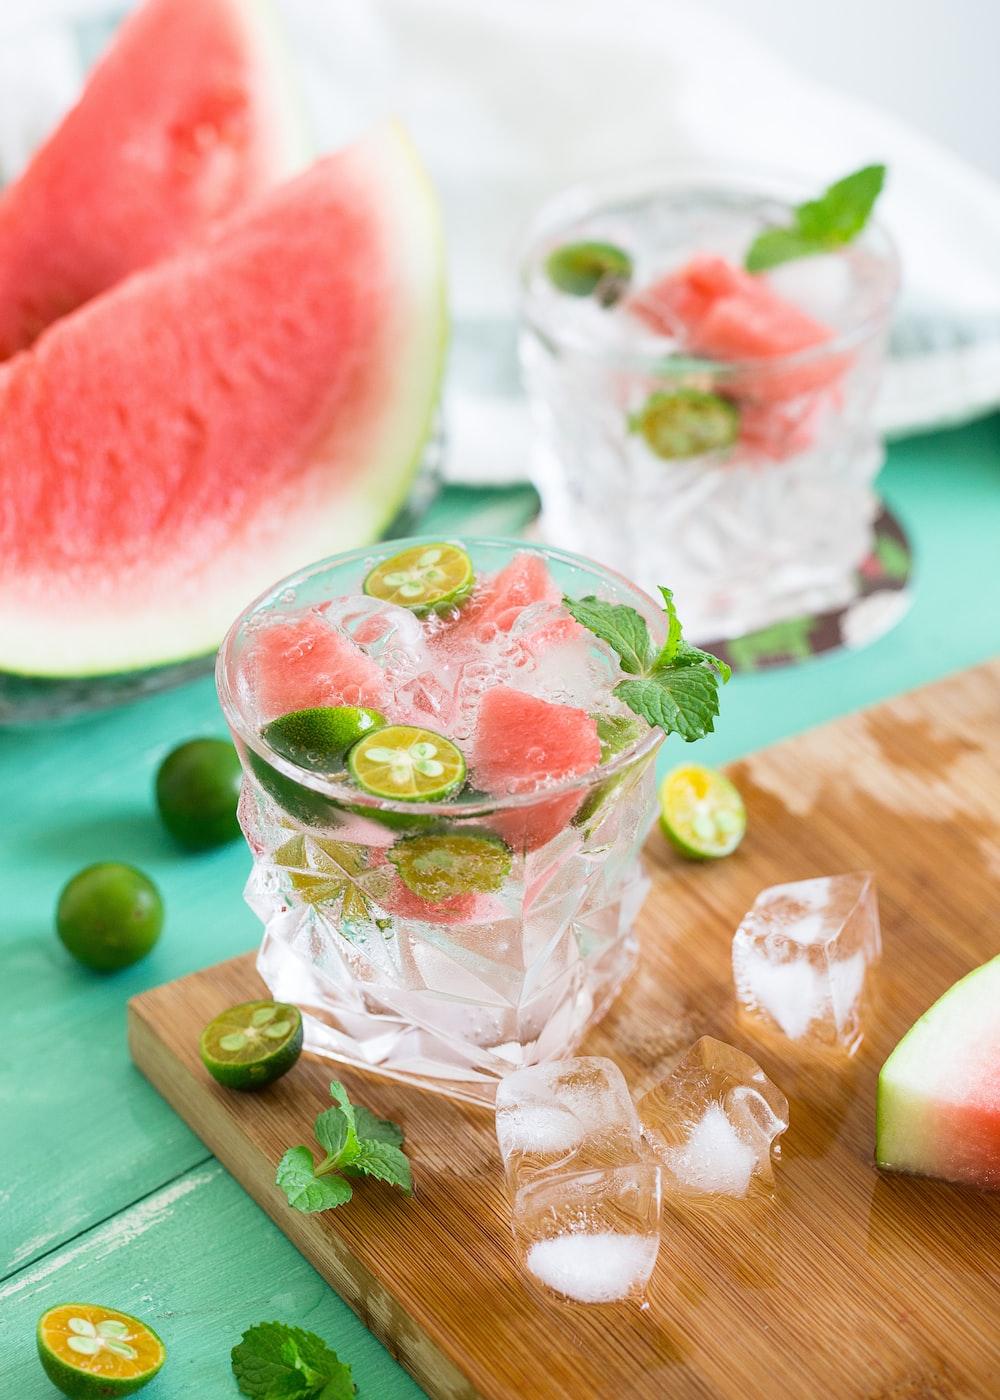 sliced watermelon with lemon on shot glass